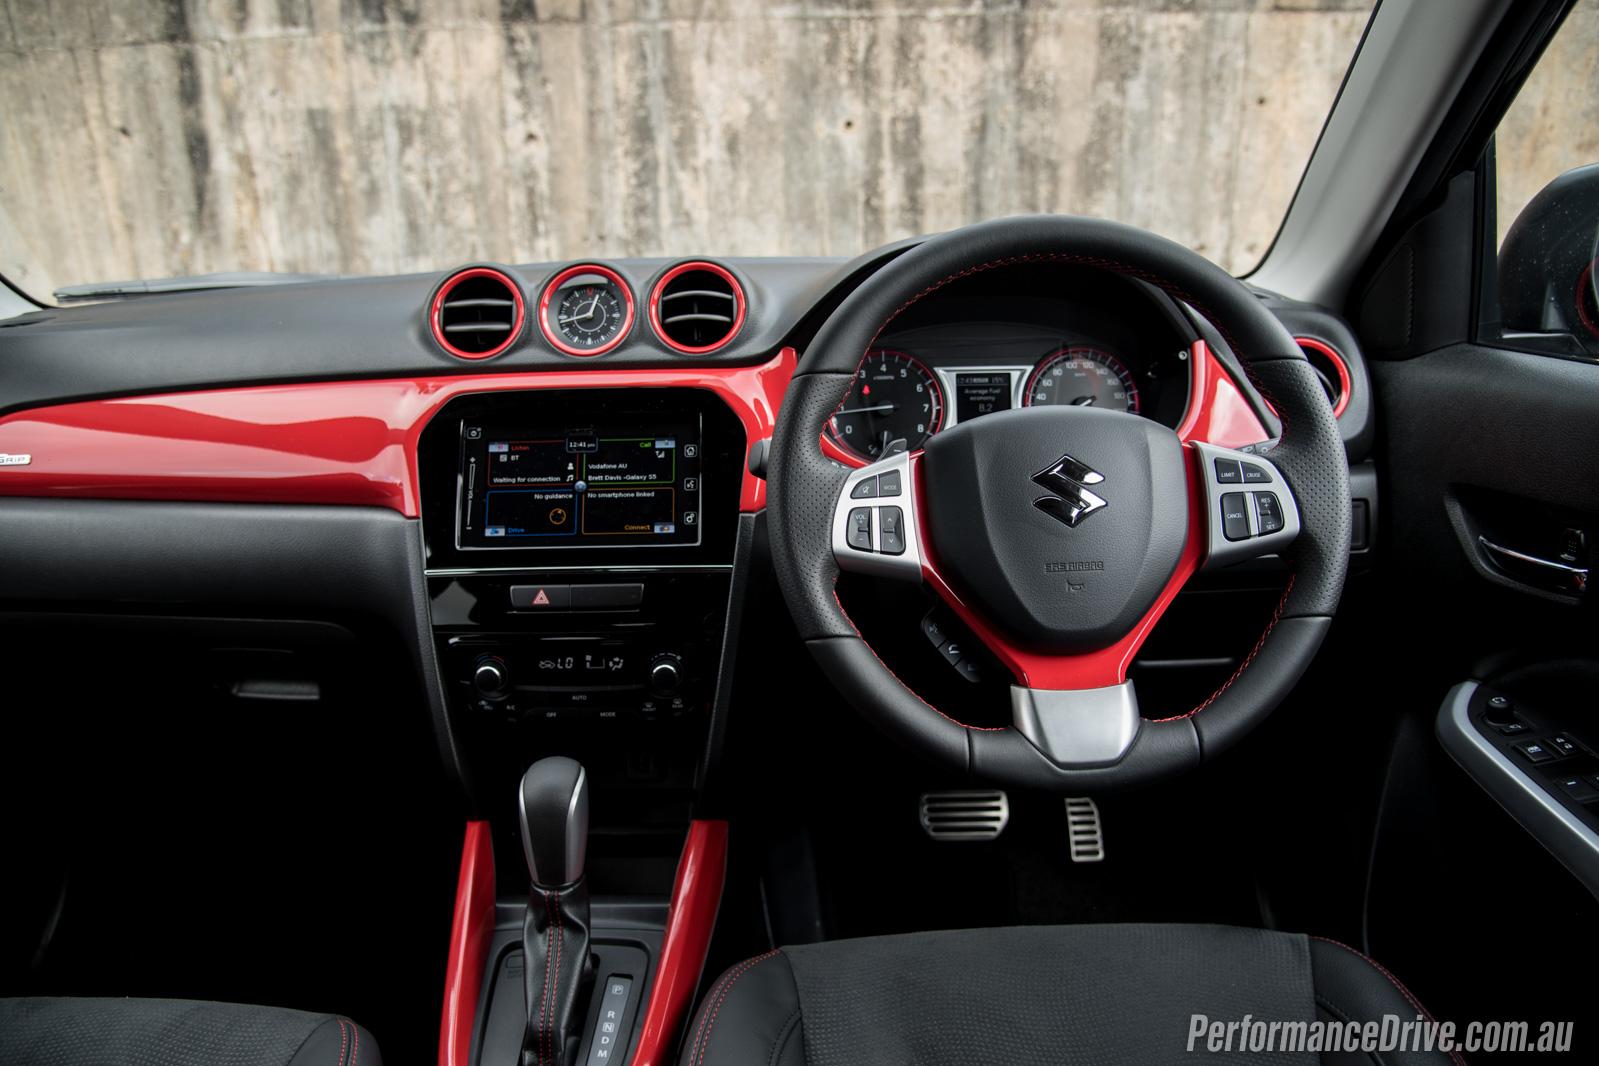 2016 Suzuki Vitara S Turbo Interior